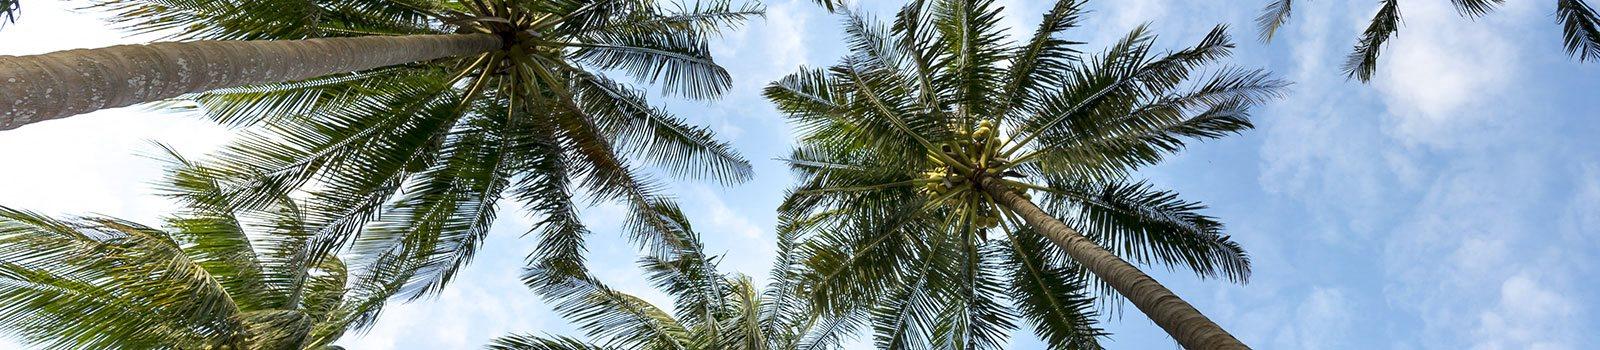 Palm trees-Santa Clara II Apartments Miami, FL